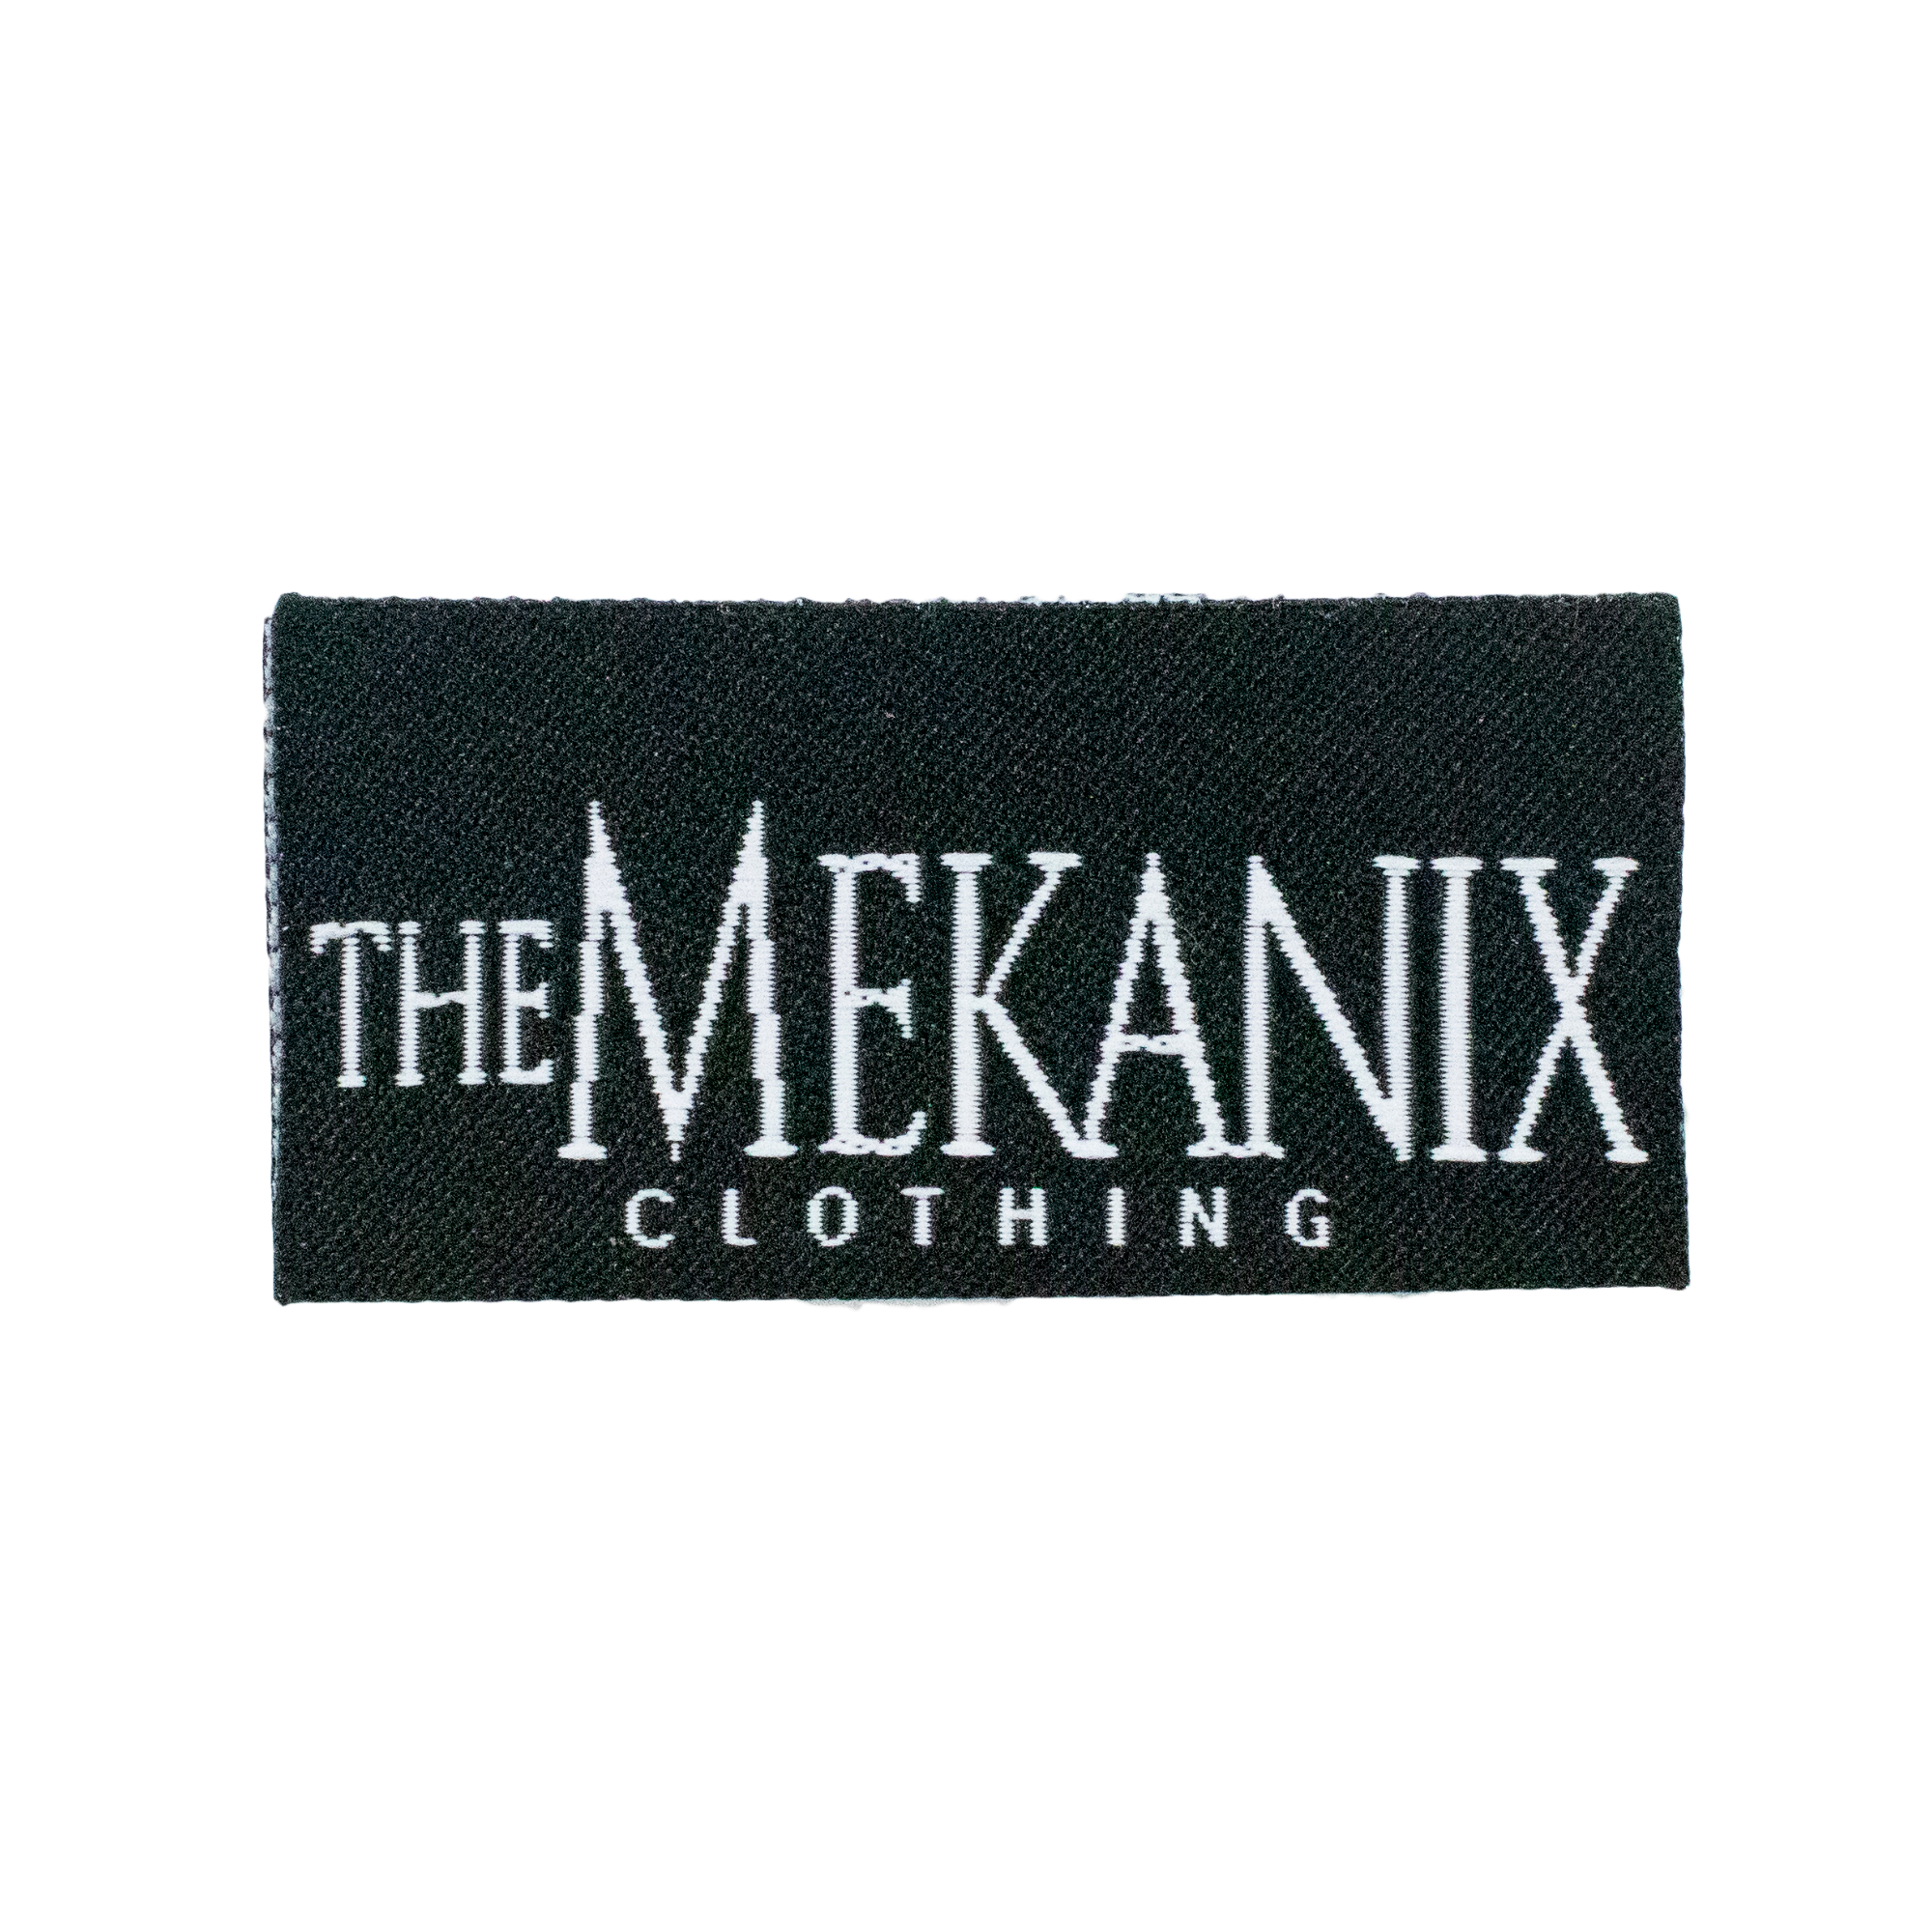 mekanix.png